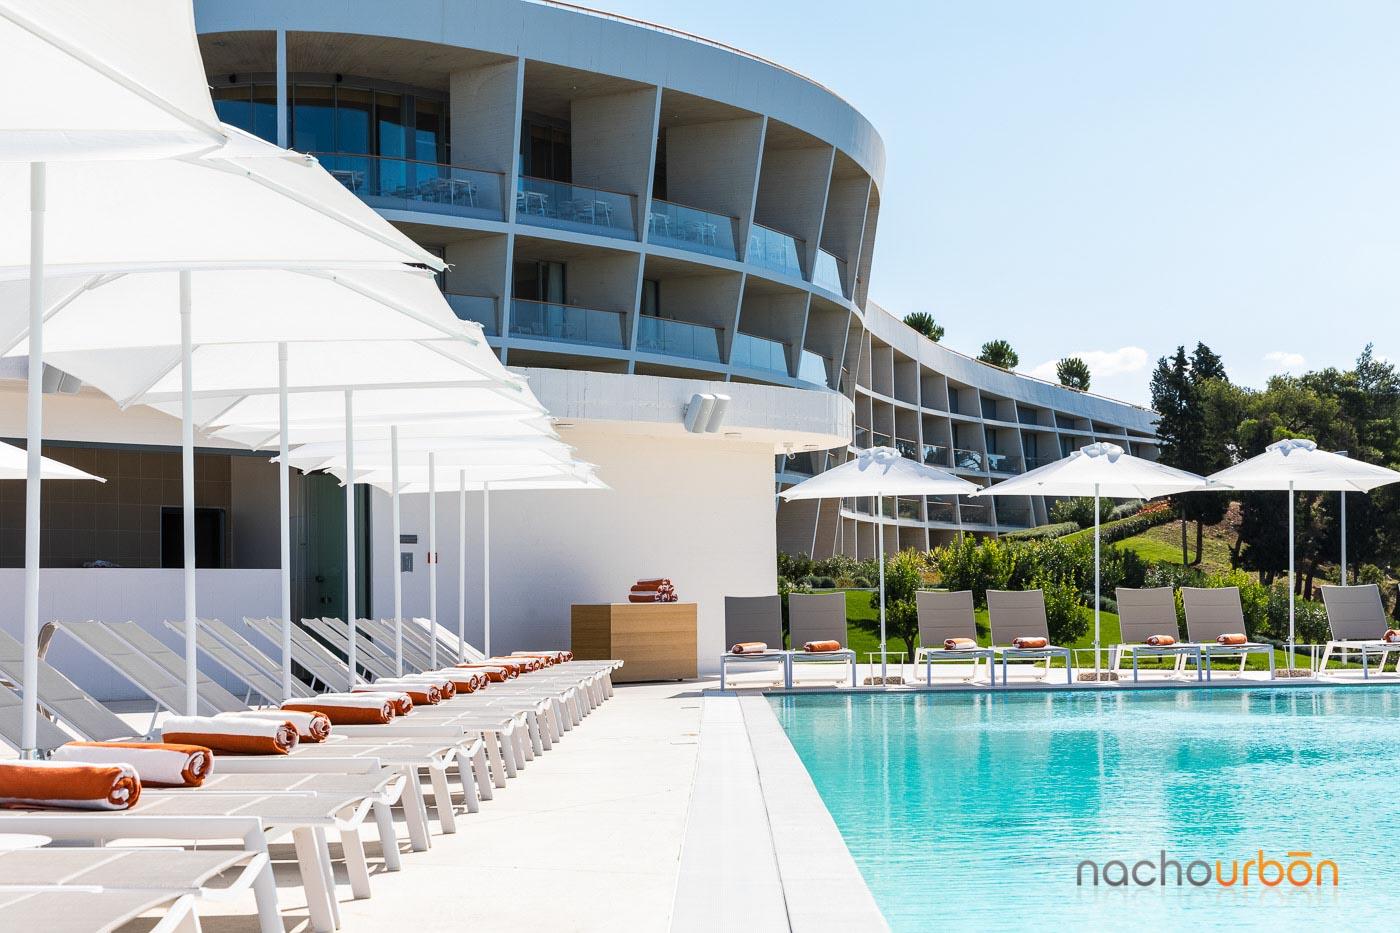 fotografo-hotel-profesional-nacho_urbon